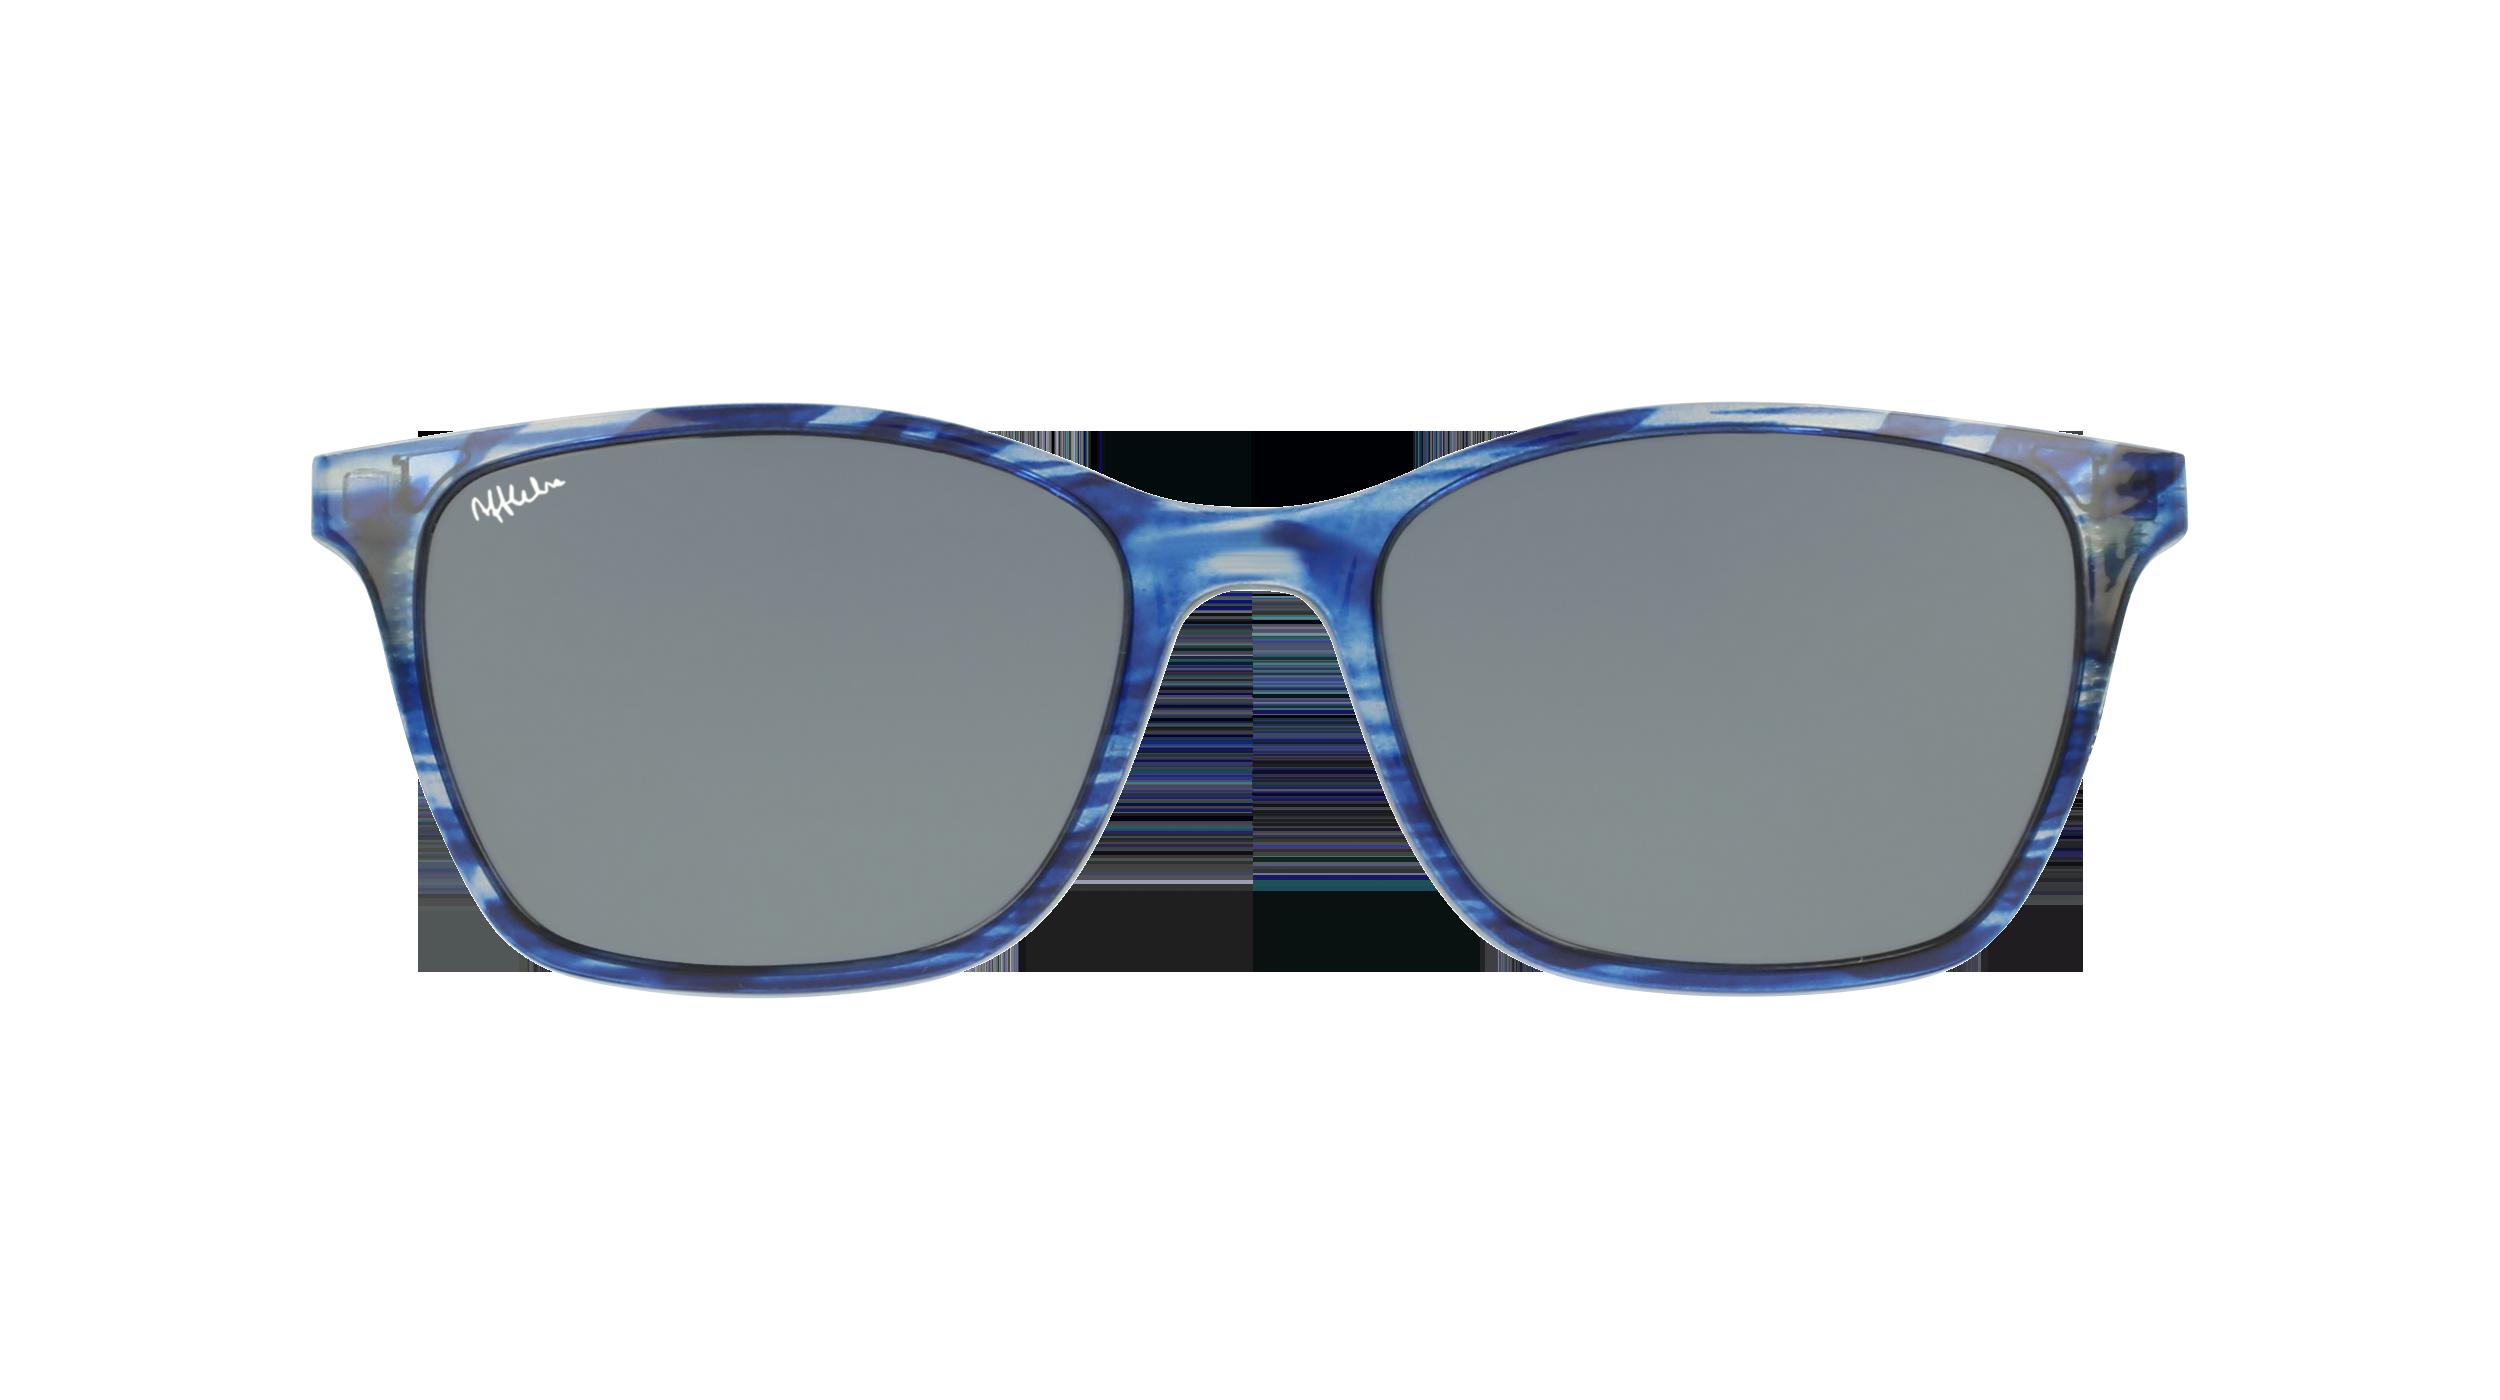 afflelou/france/products/smart_clip/clips_glasses/07630036457580.png